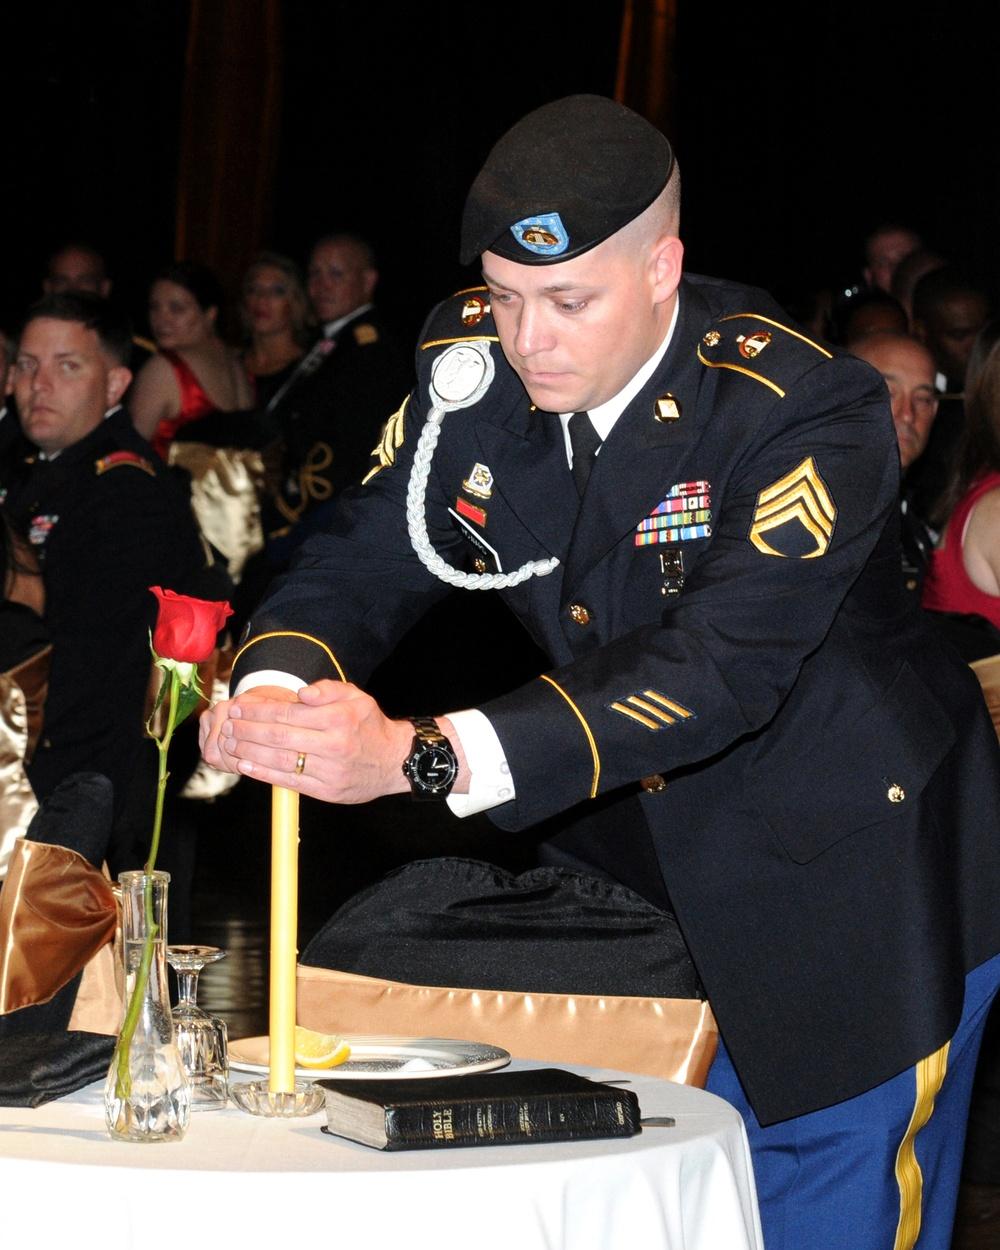 Fort Carson hosts Army 237th Birthday Ball